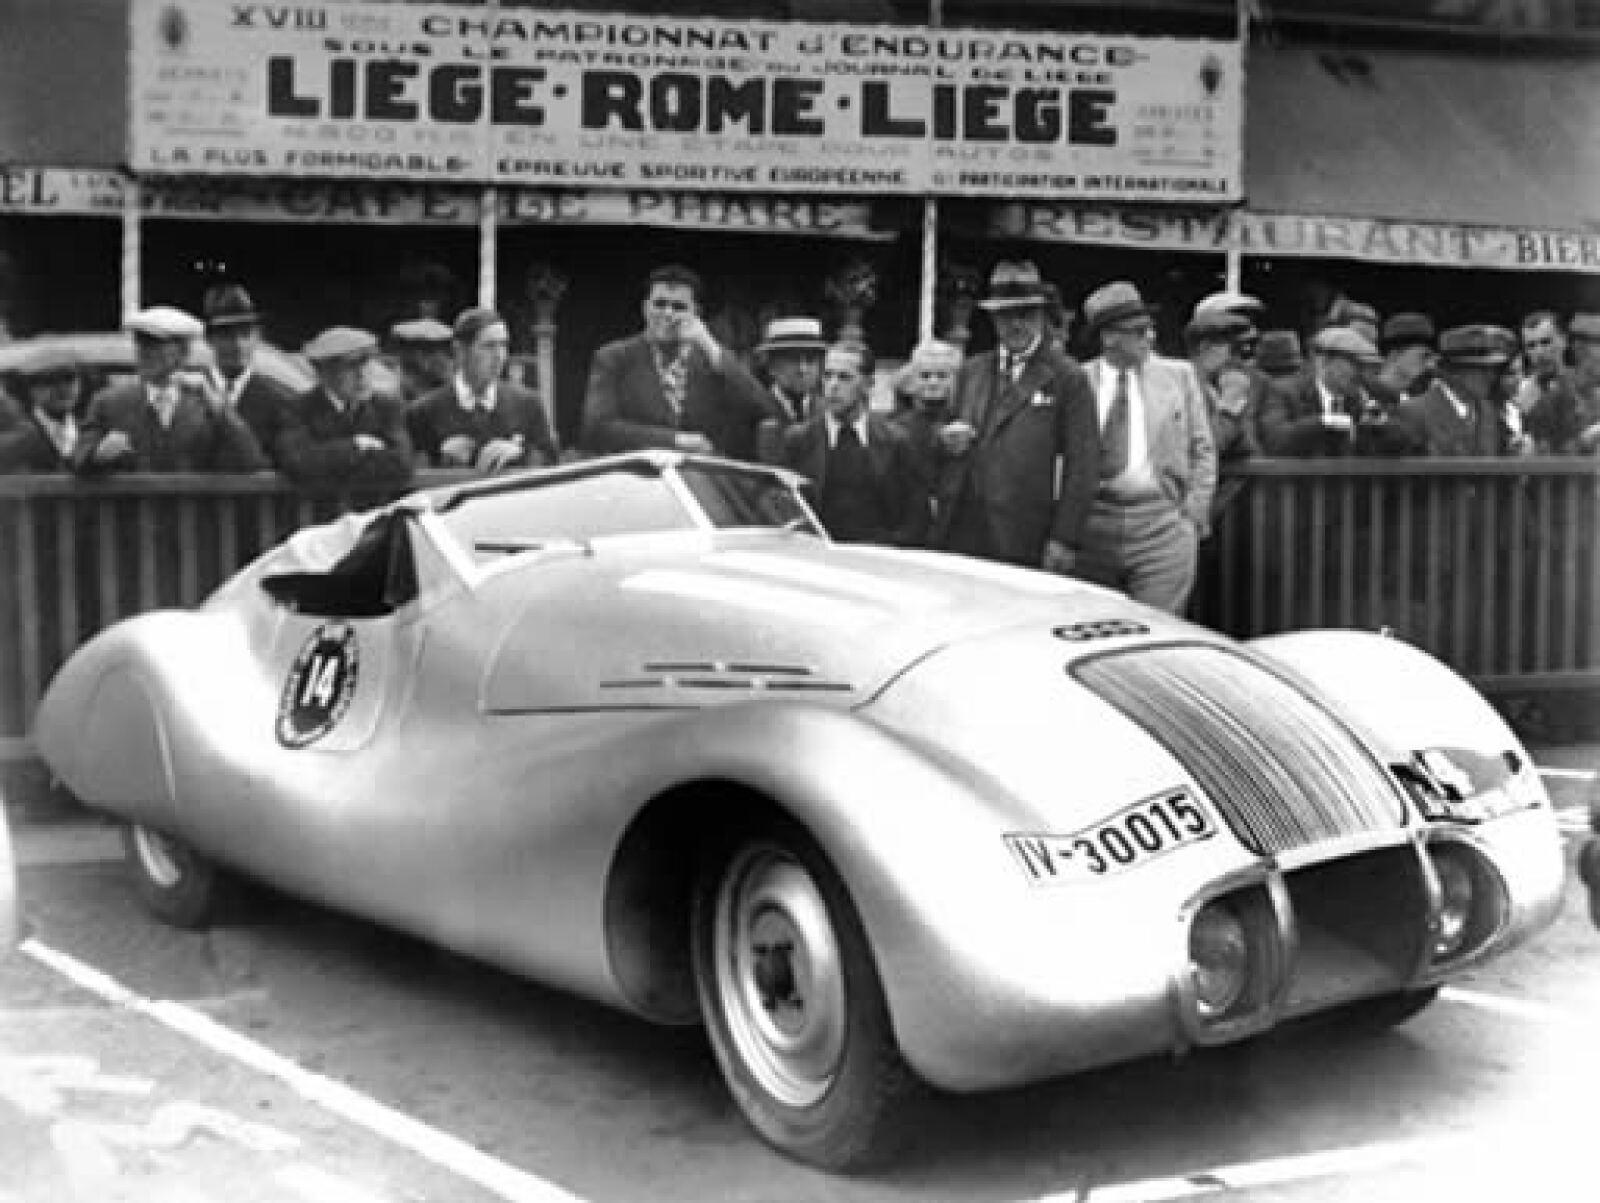 Un Wanderer Streamline Special de 1939 en la carrera Liége en Roma.